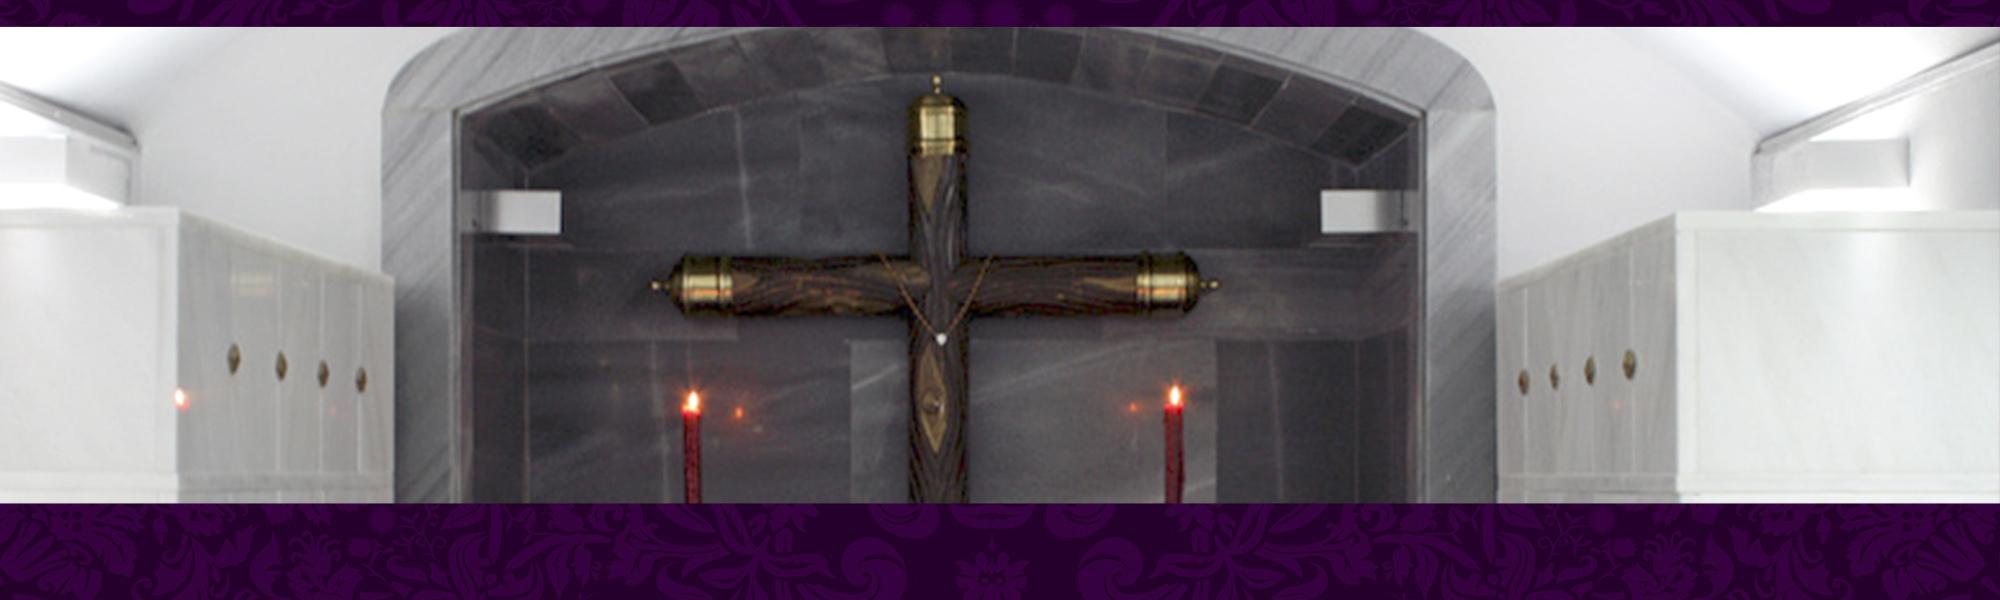 Se reanudan las visitas al Columbario